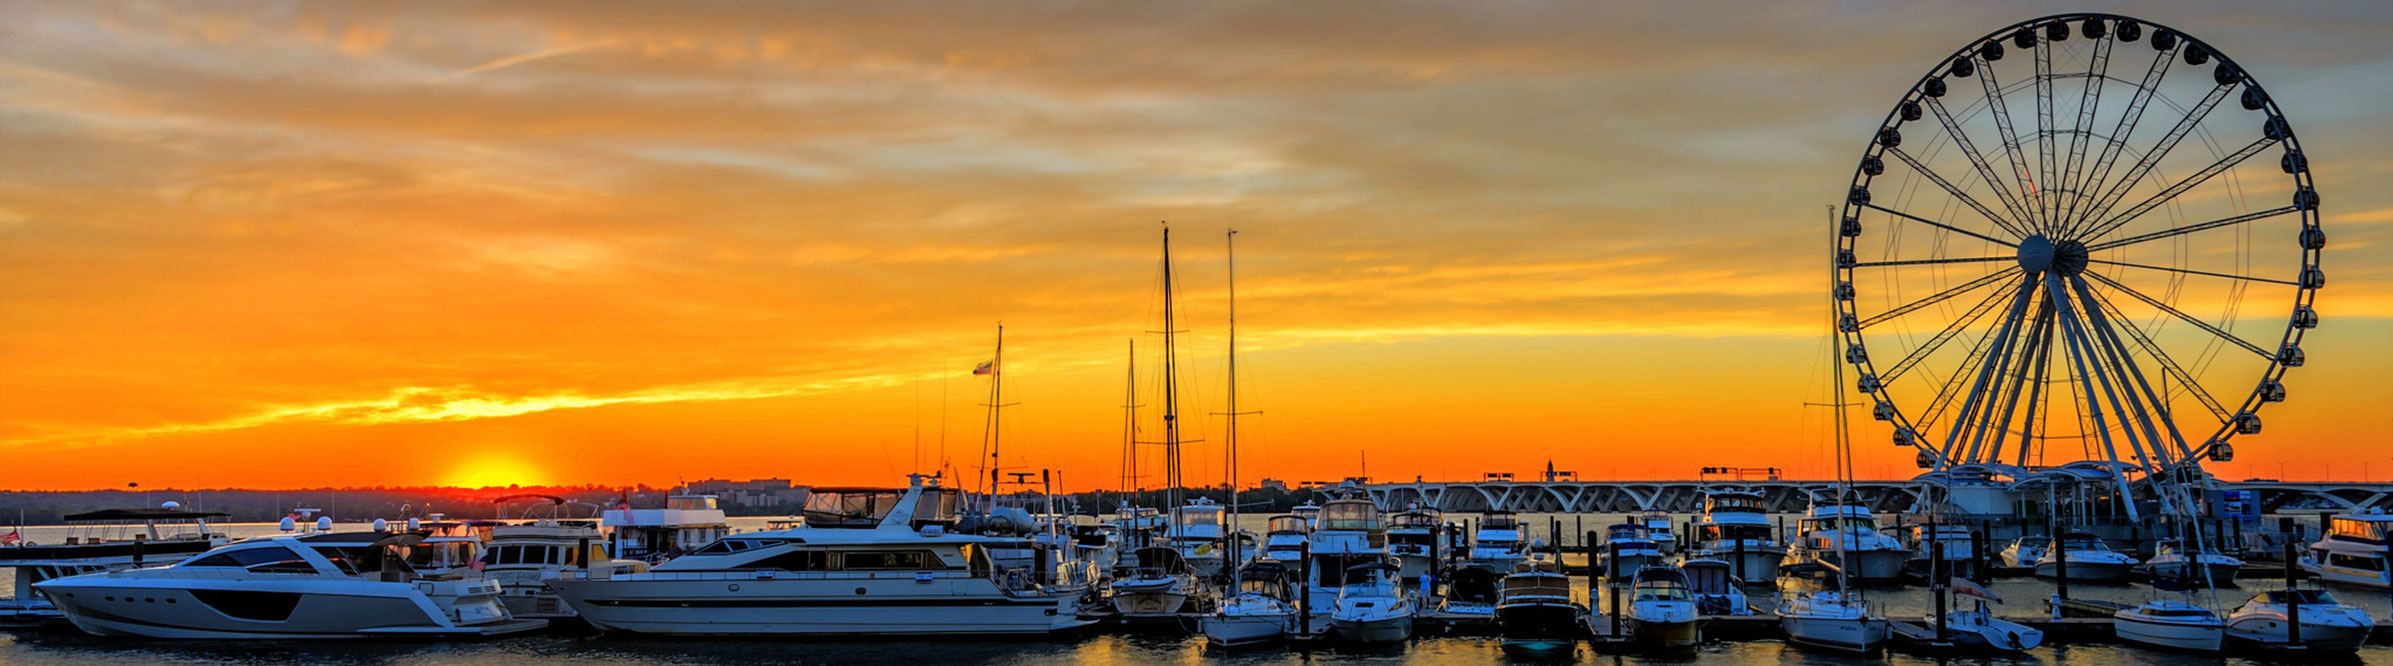 Destination Guide: National Harbor Marina